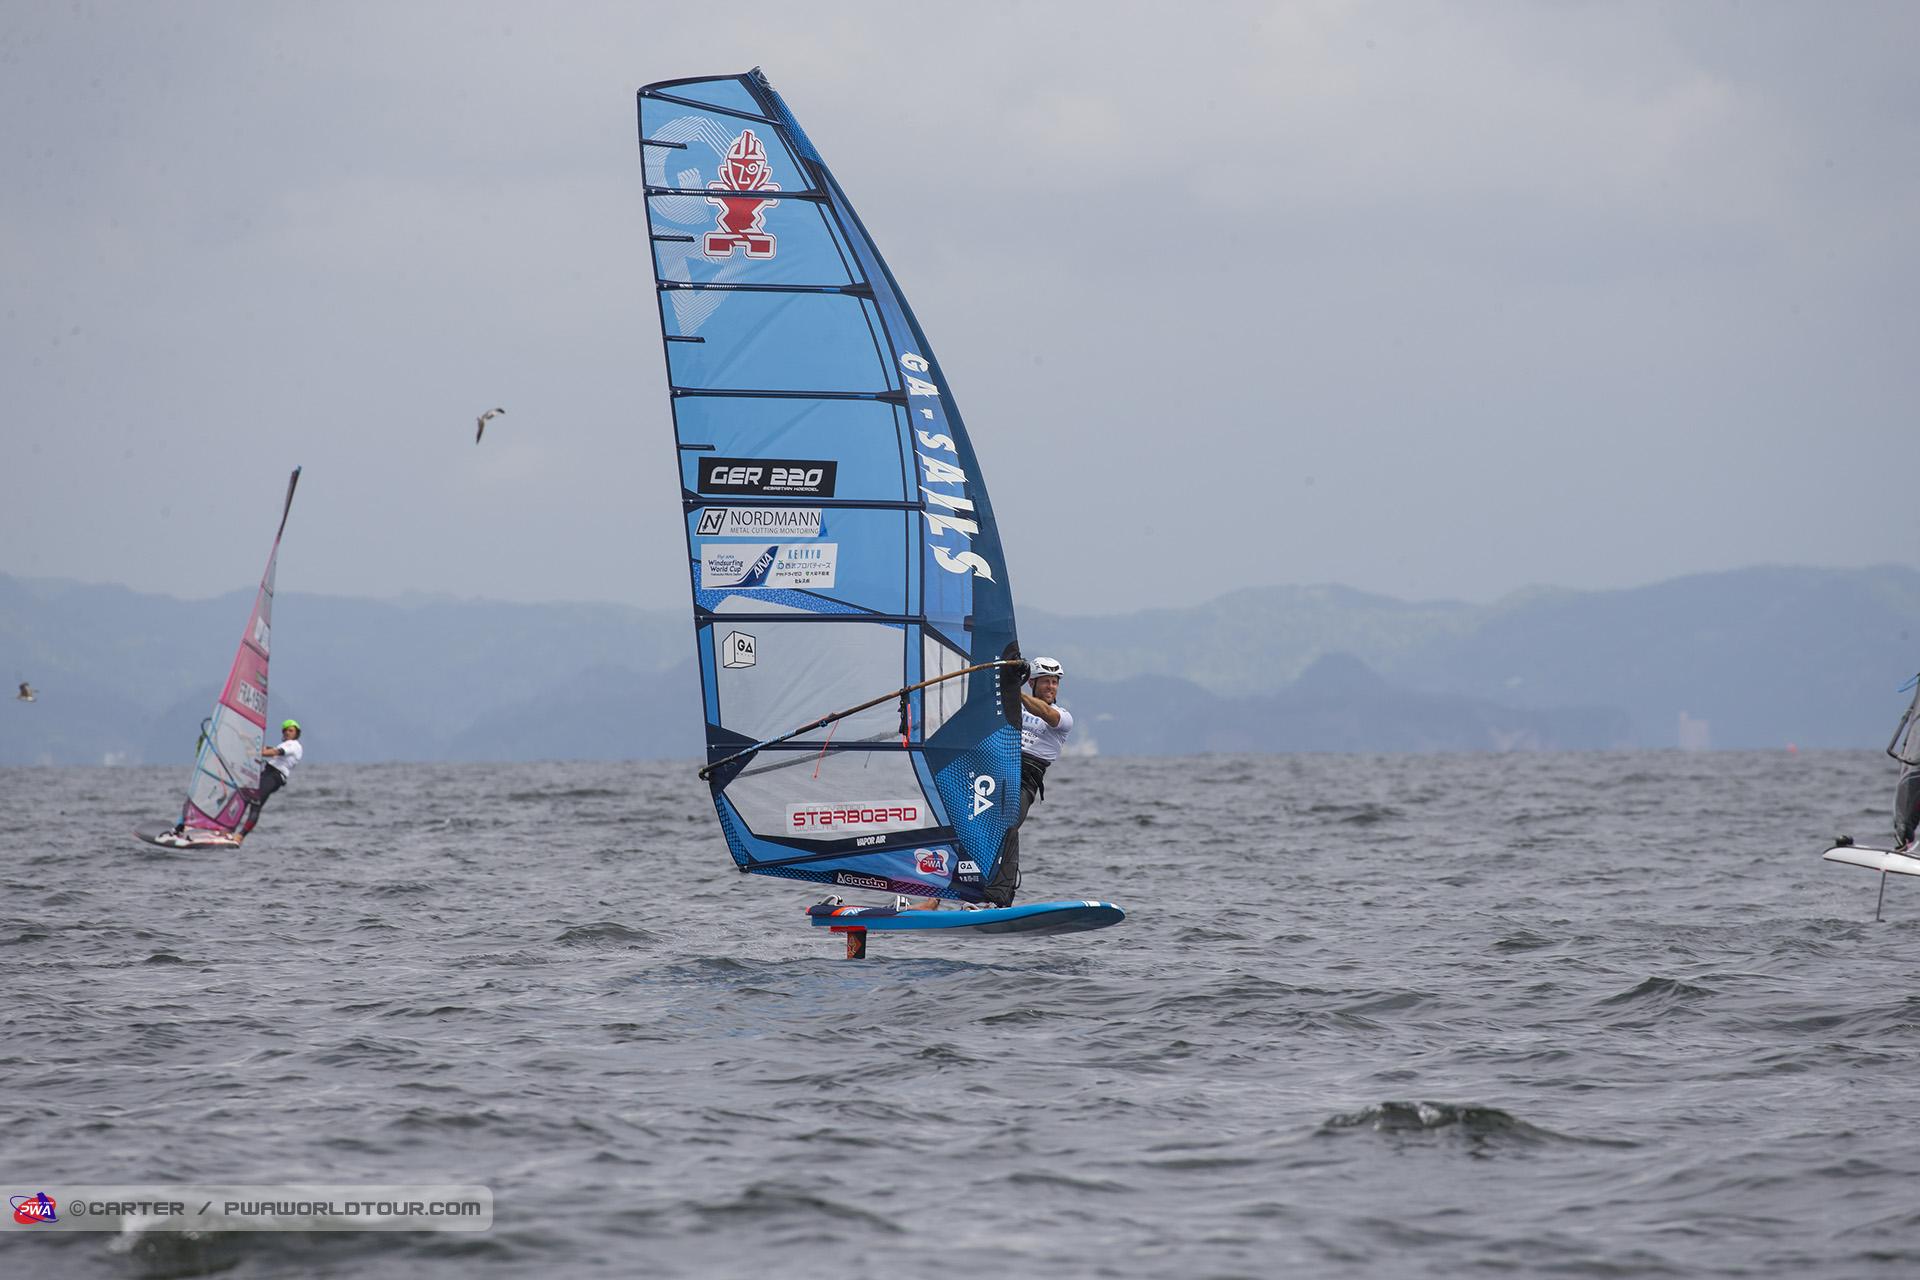 JP19_ls_Sebastian_Kordel_takes_2nd.jpg